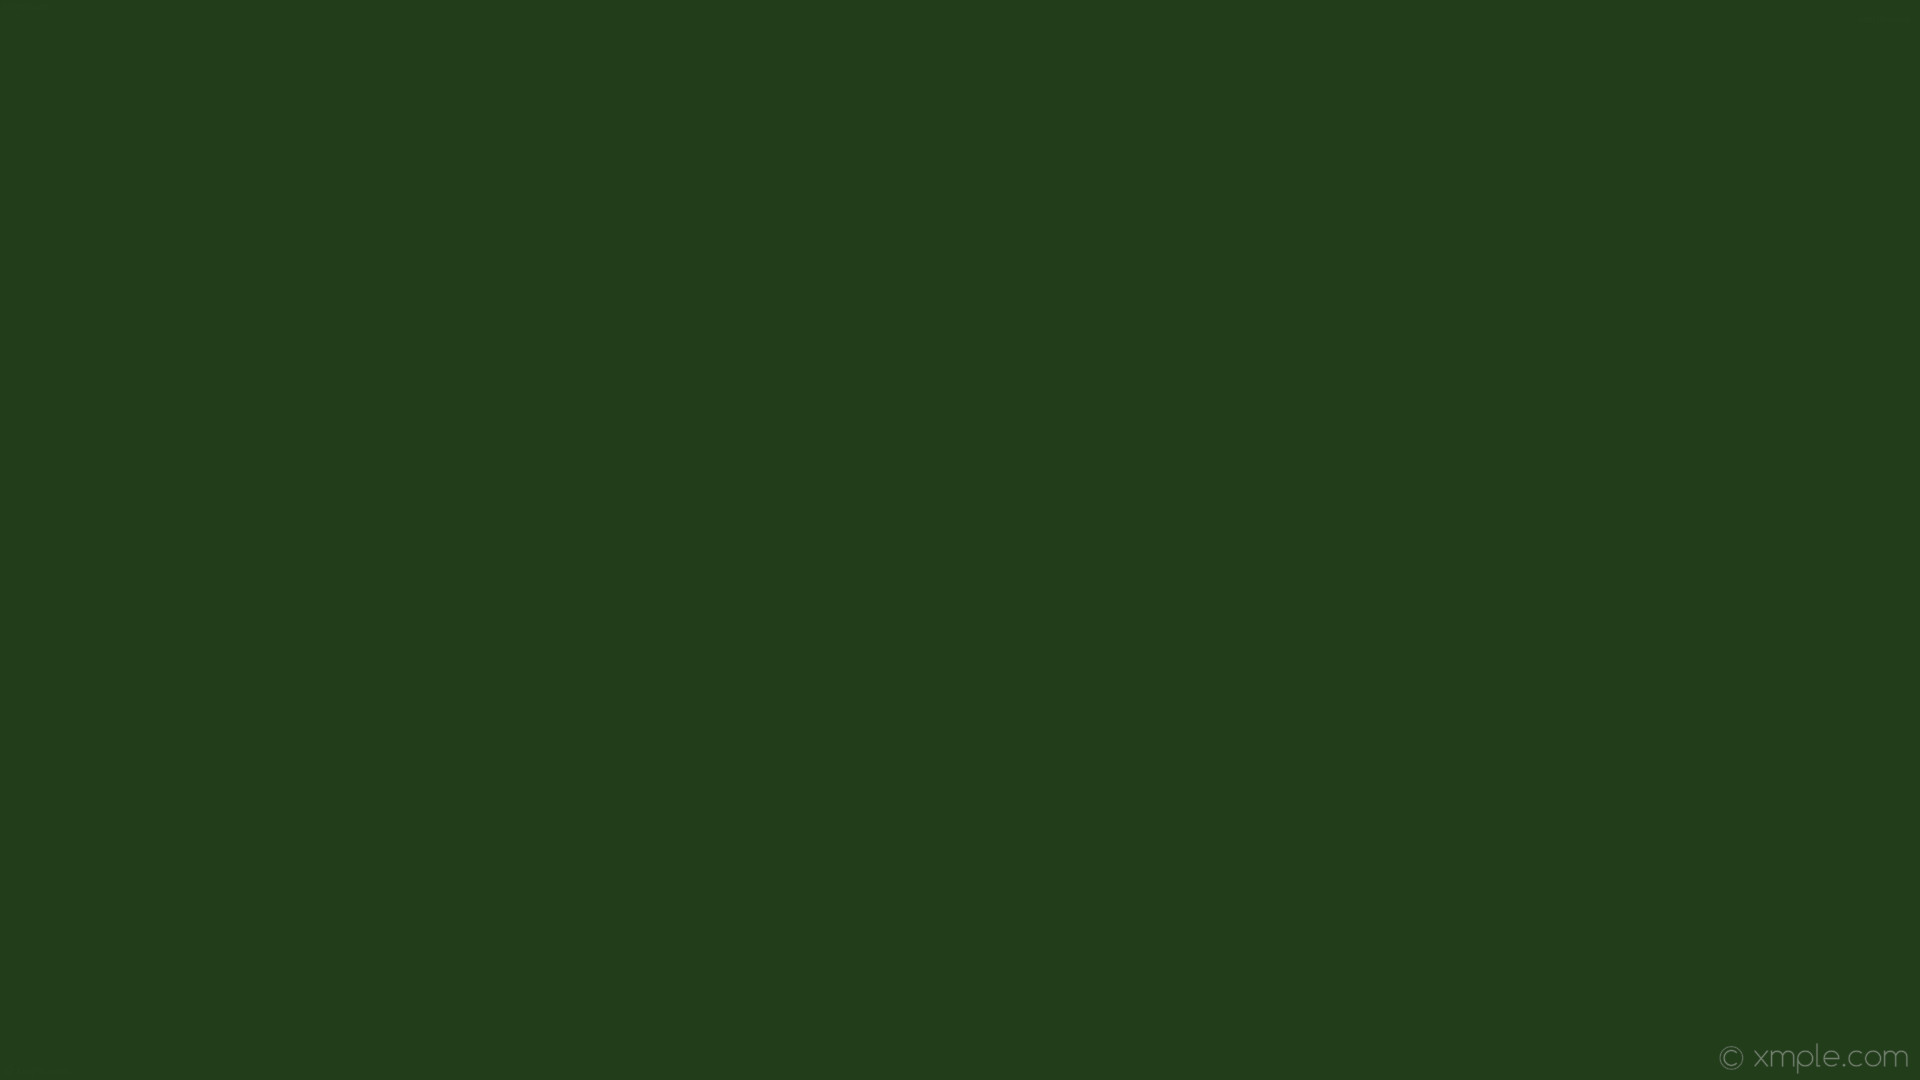 Res: 1920x1080, wallpaper plain green solid color one colour single dark green #223d1a